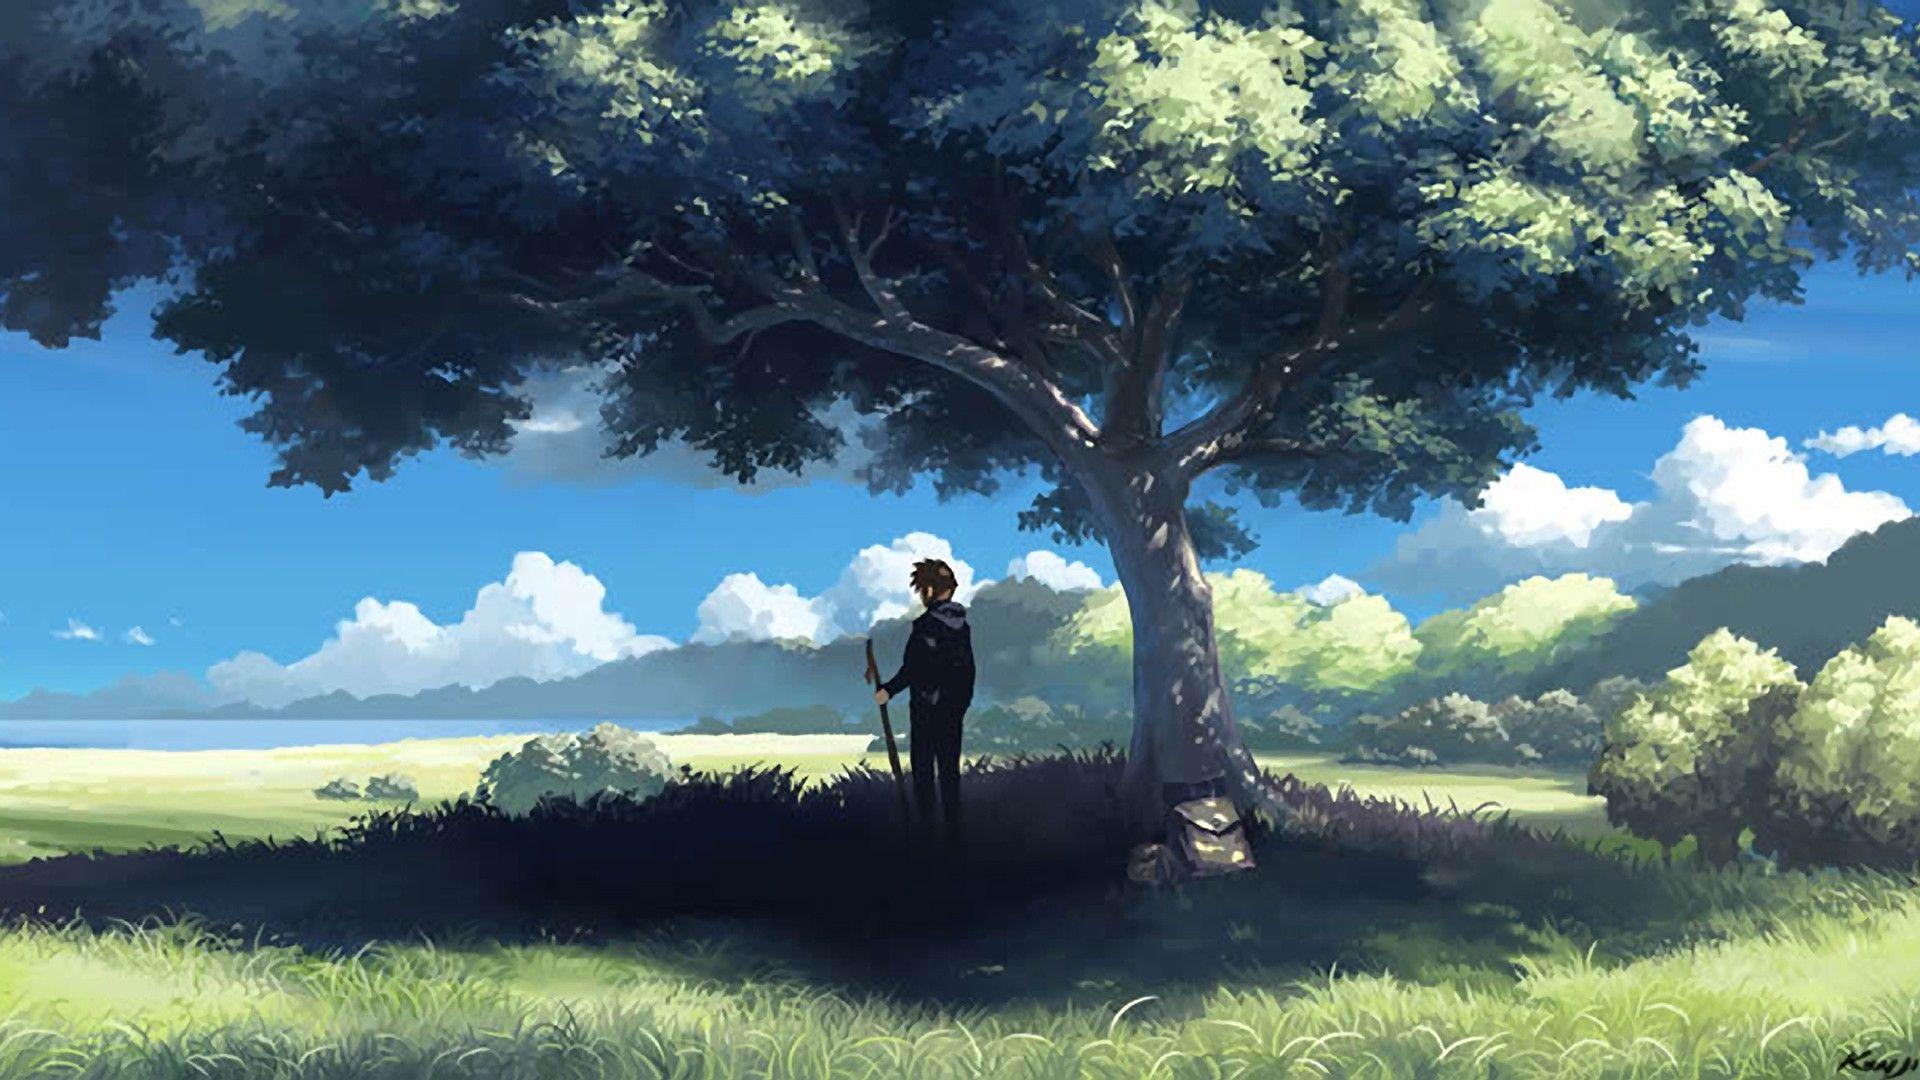 Desktop And Mobile Wallpaper Anime Scenery Anime Scenery Wallpaper Scenery Wallpaper